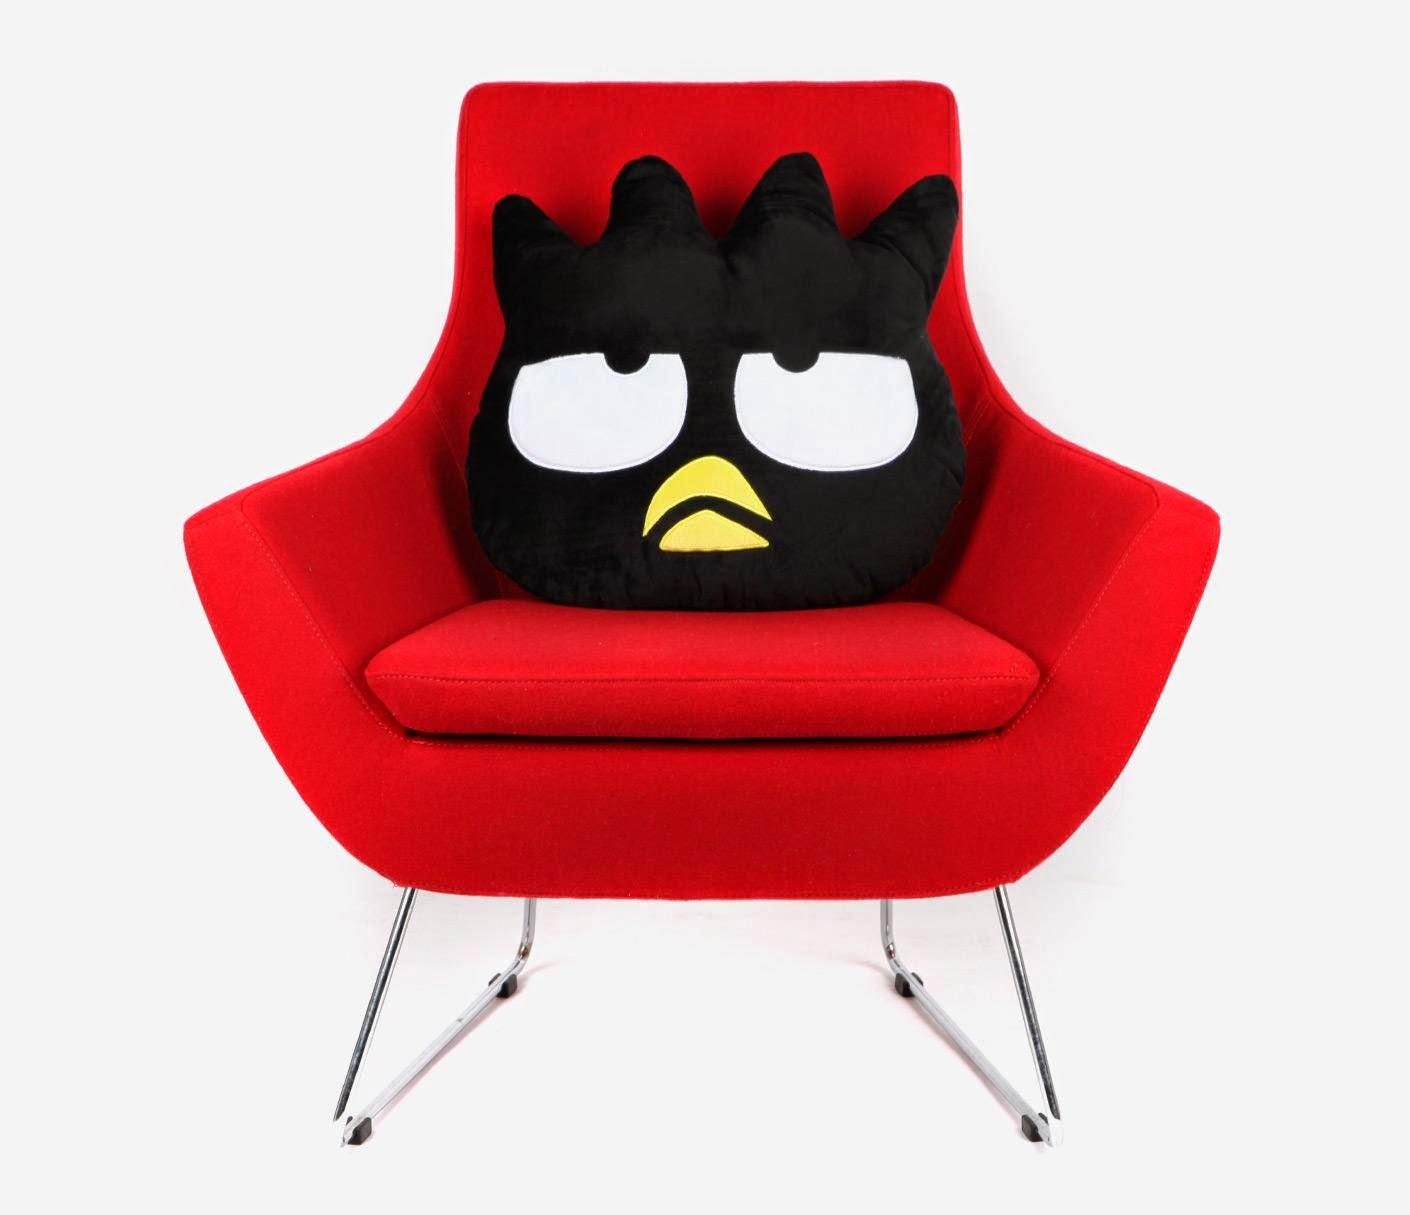 Sanrio character cushions badtz maru